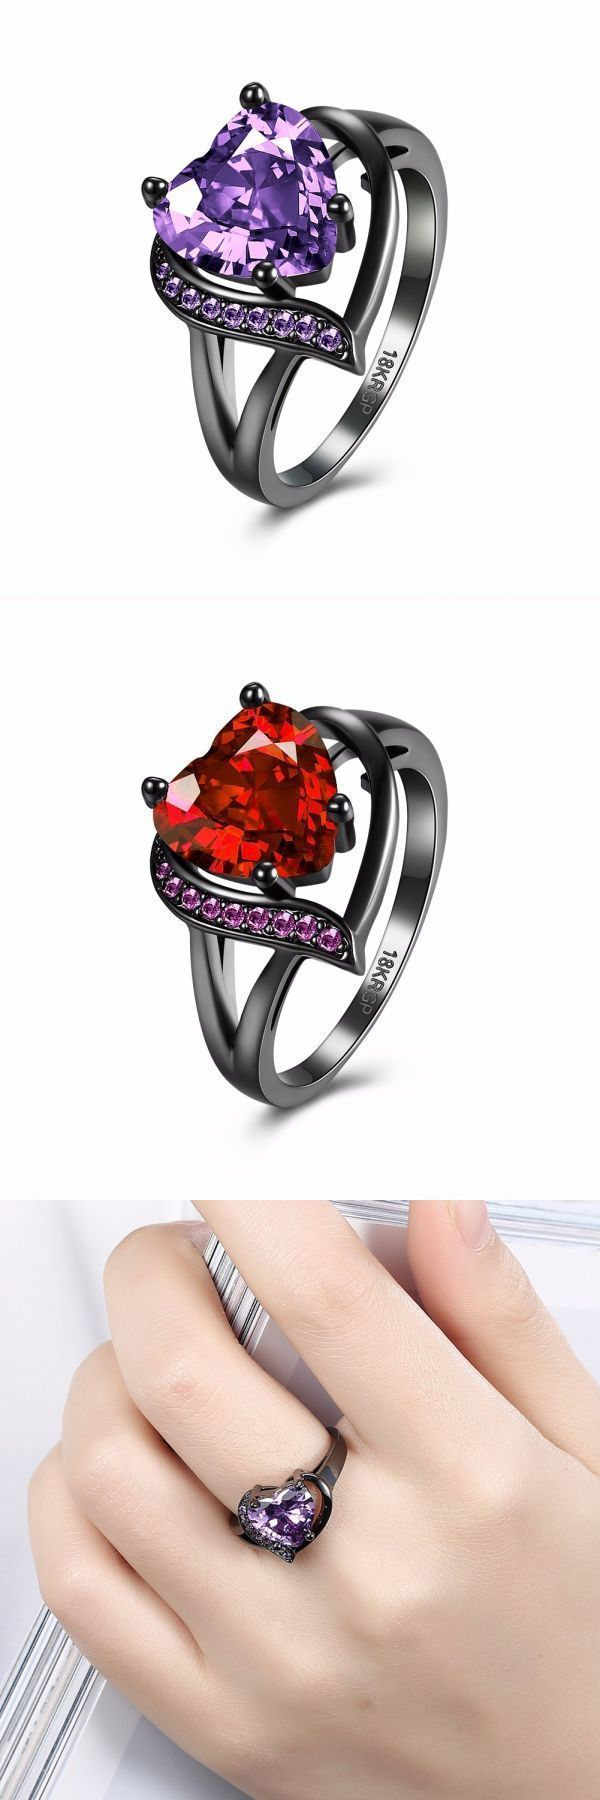 Wedding jewelry and tiara sets inalis heart zircon rhinestone ring for women #wedding #jewelry #kanata #wedding #jewelry #las #vegas #wedding #jewelry #with #ivory #dress #wedding #jewelry #with #strapless #dress #weddingjewelry